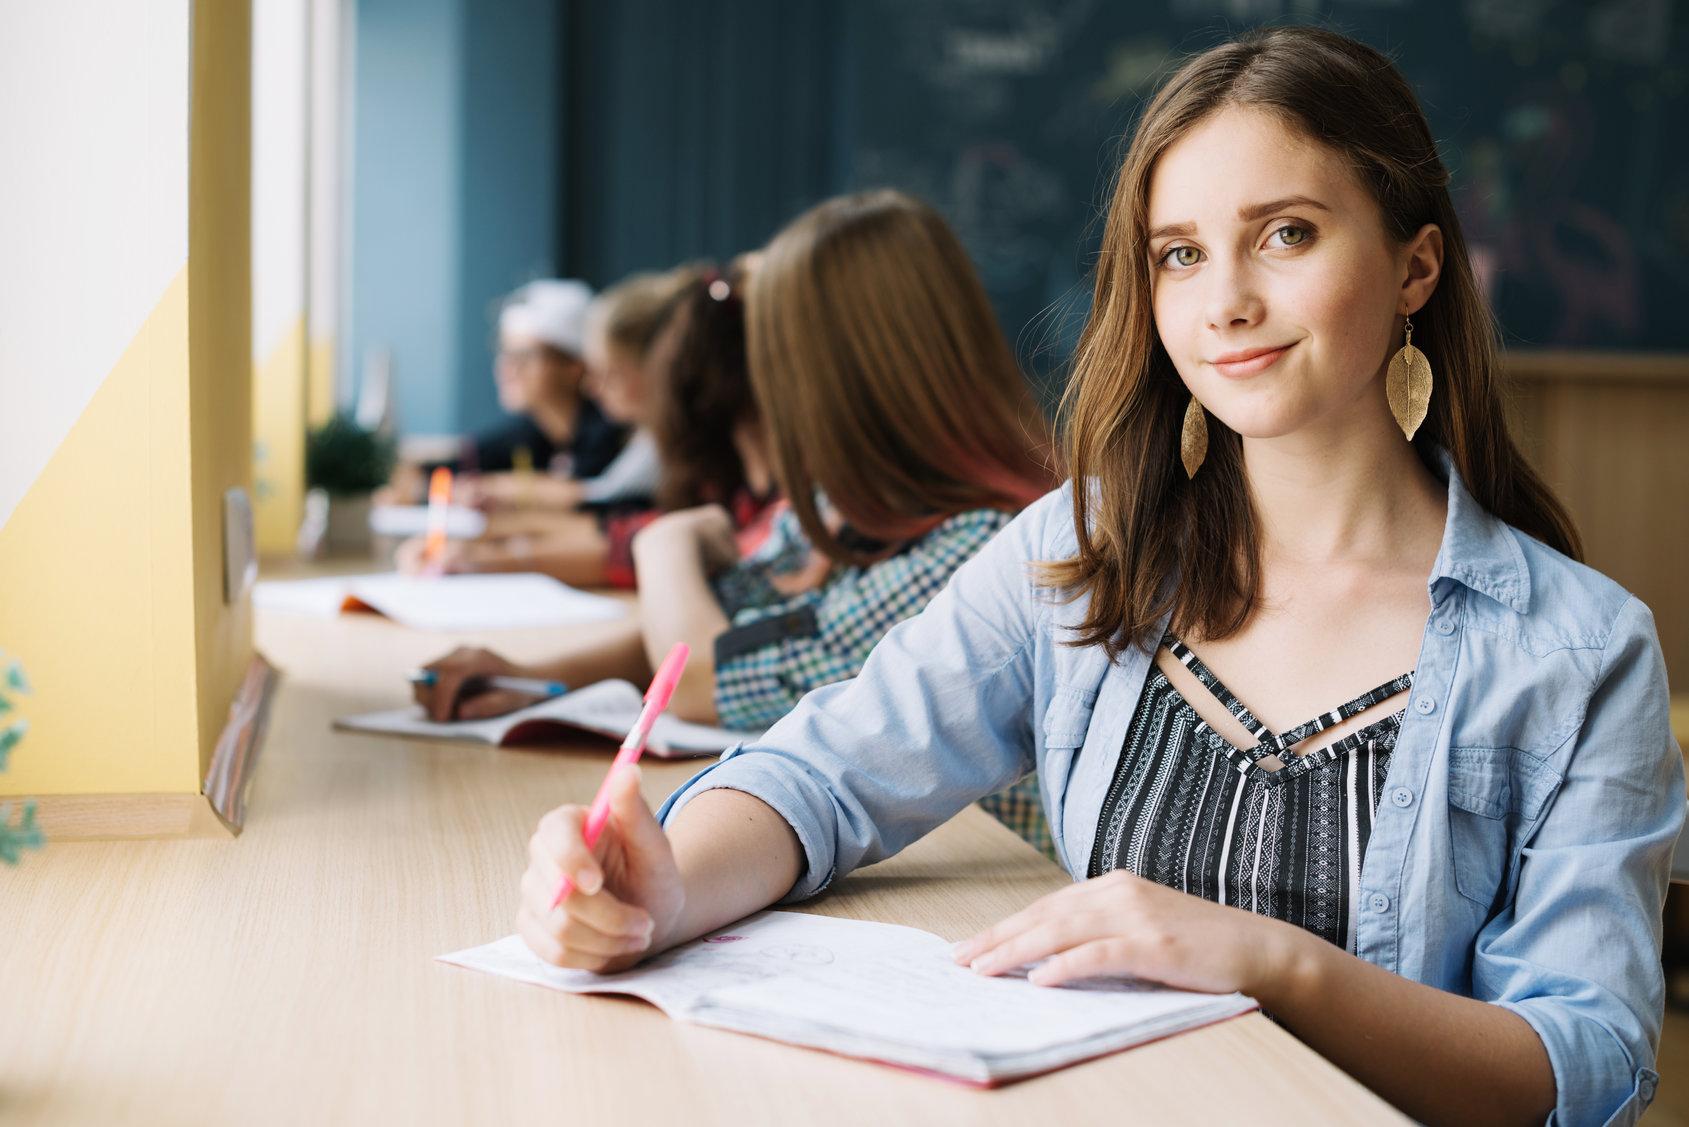 Examenul de admitere: de la student la viitor student